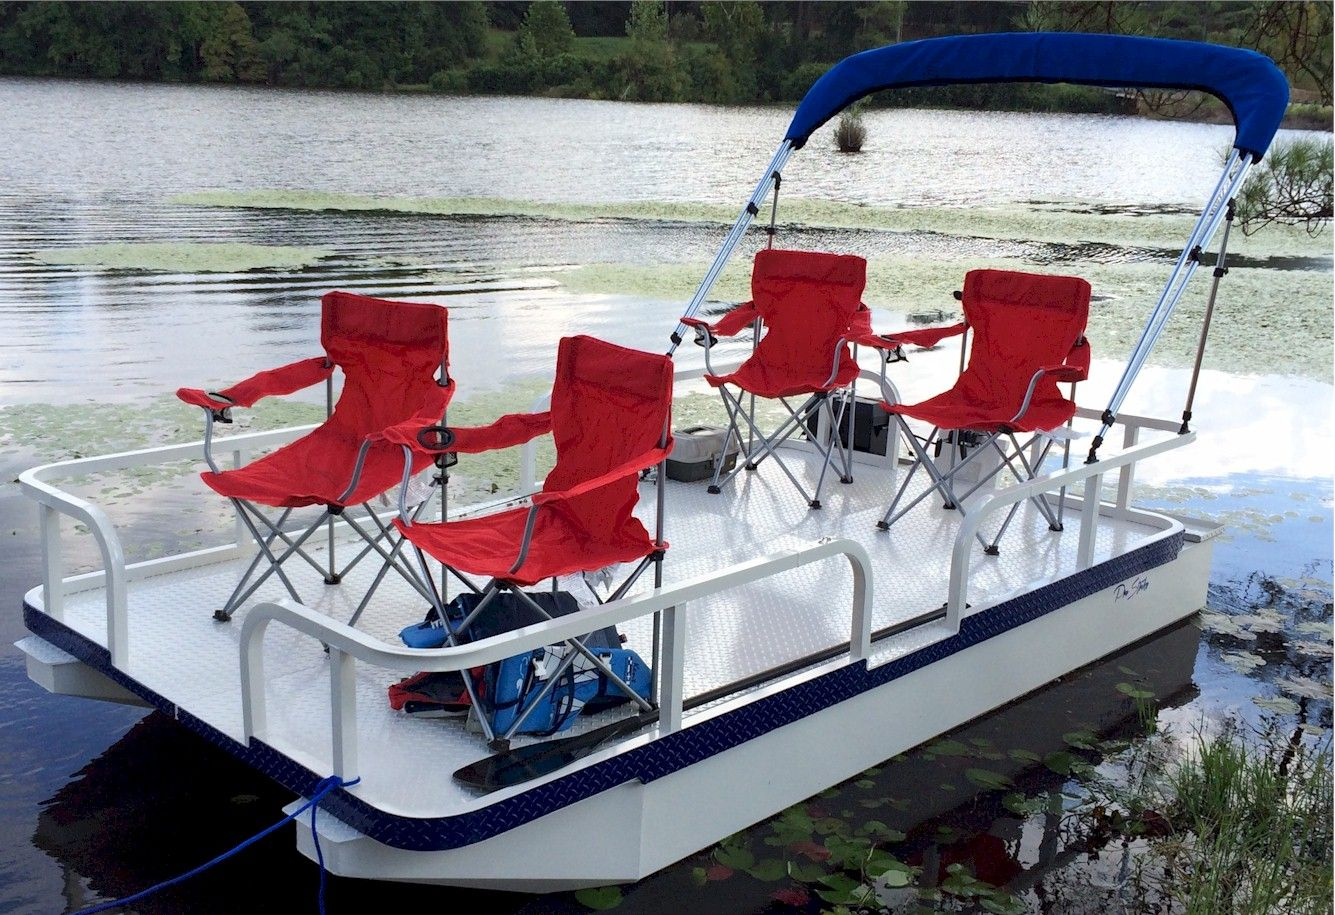 Pro strike 126 exr mini pontoon boat cottage garden for Mini pontoon fishing boats